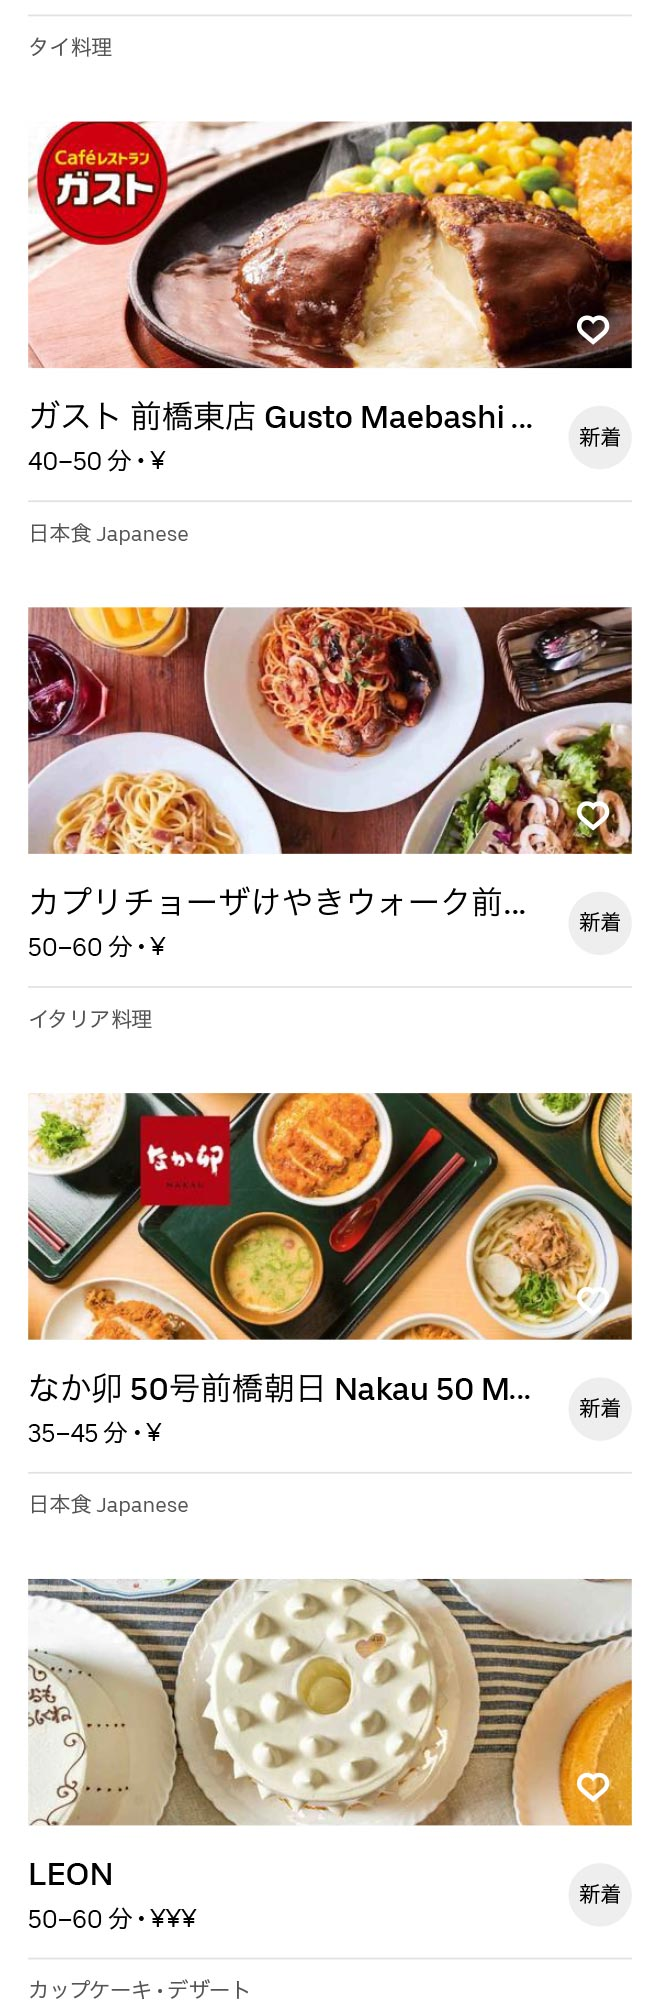 Chuou maebashi menu 2009 2